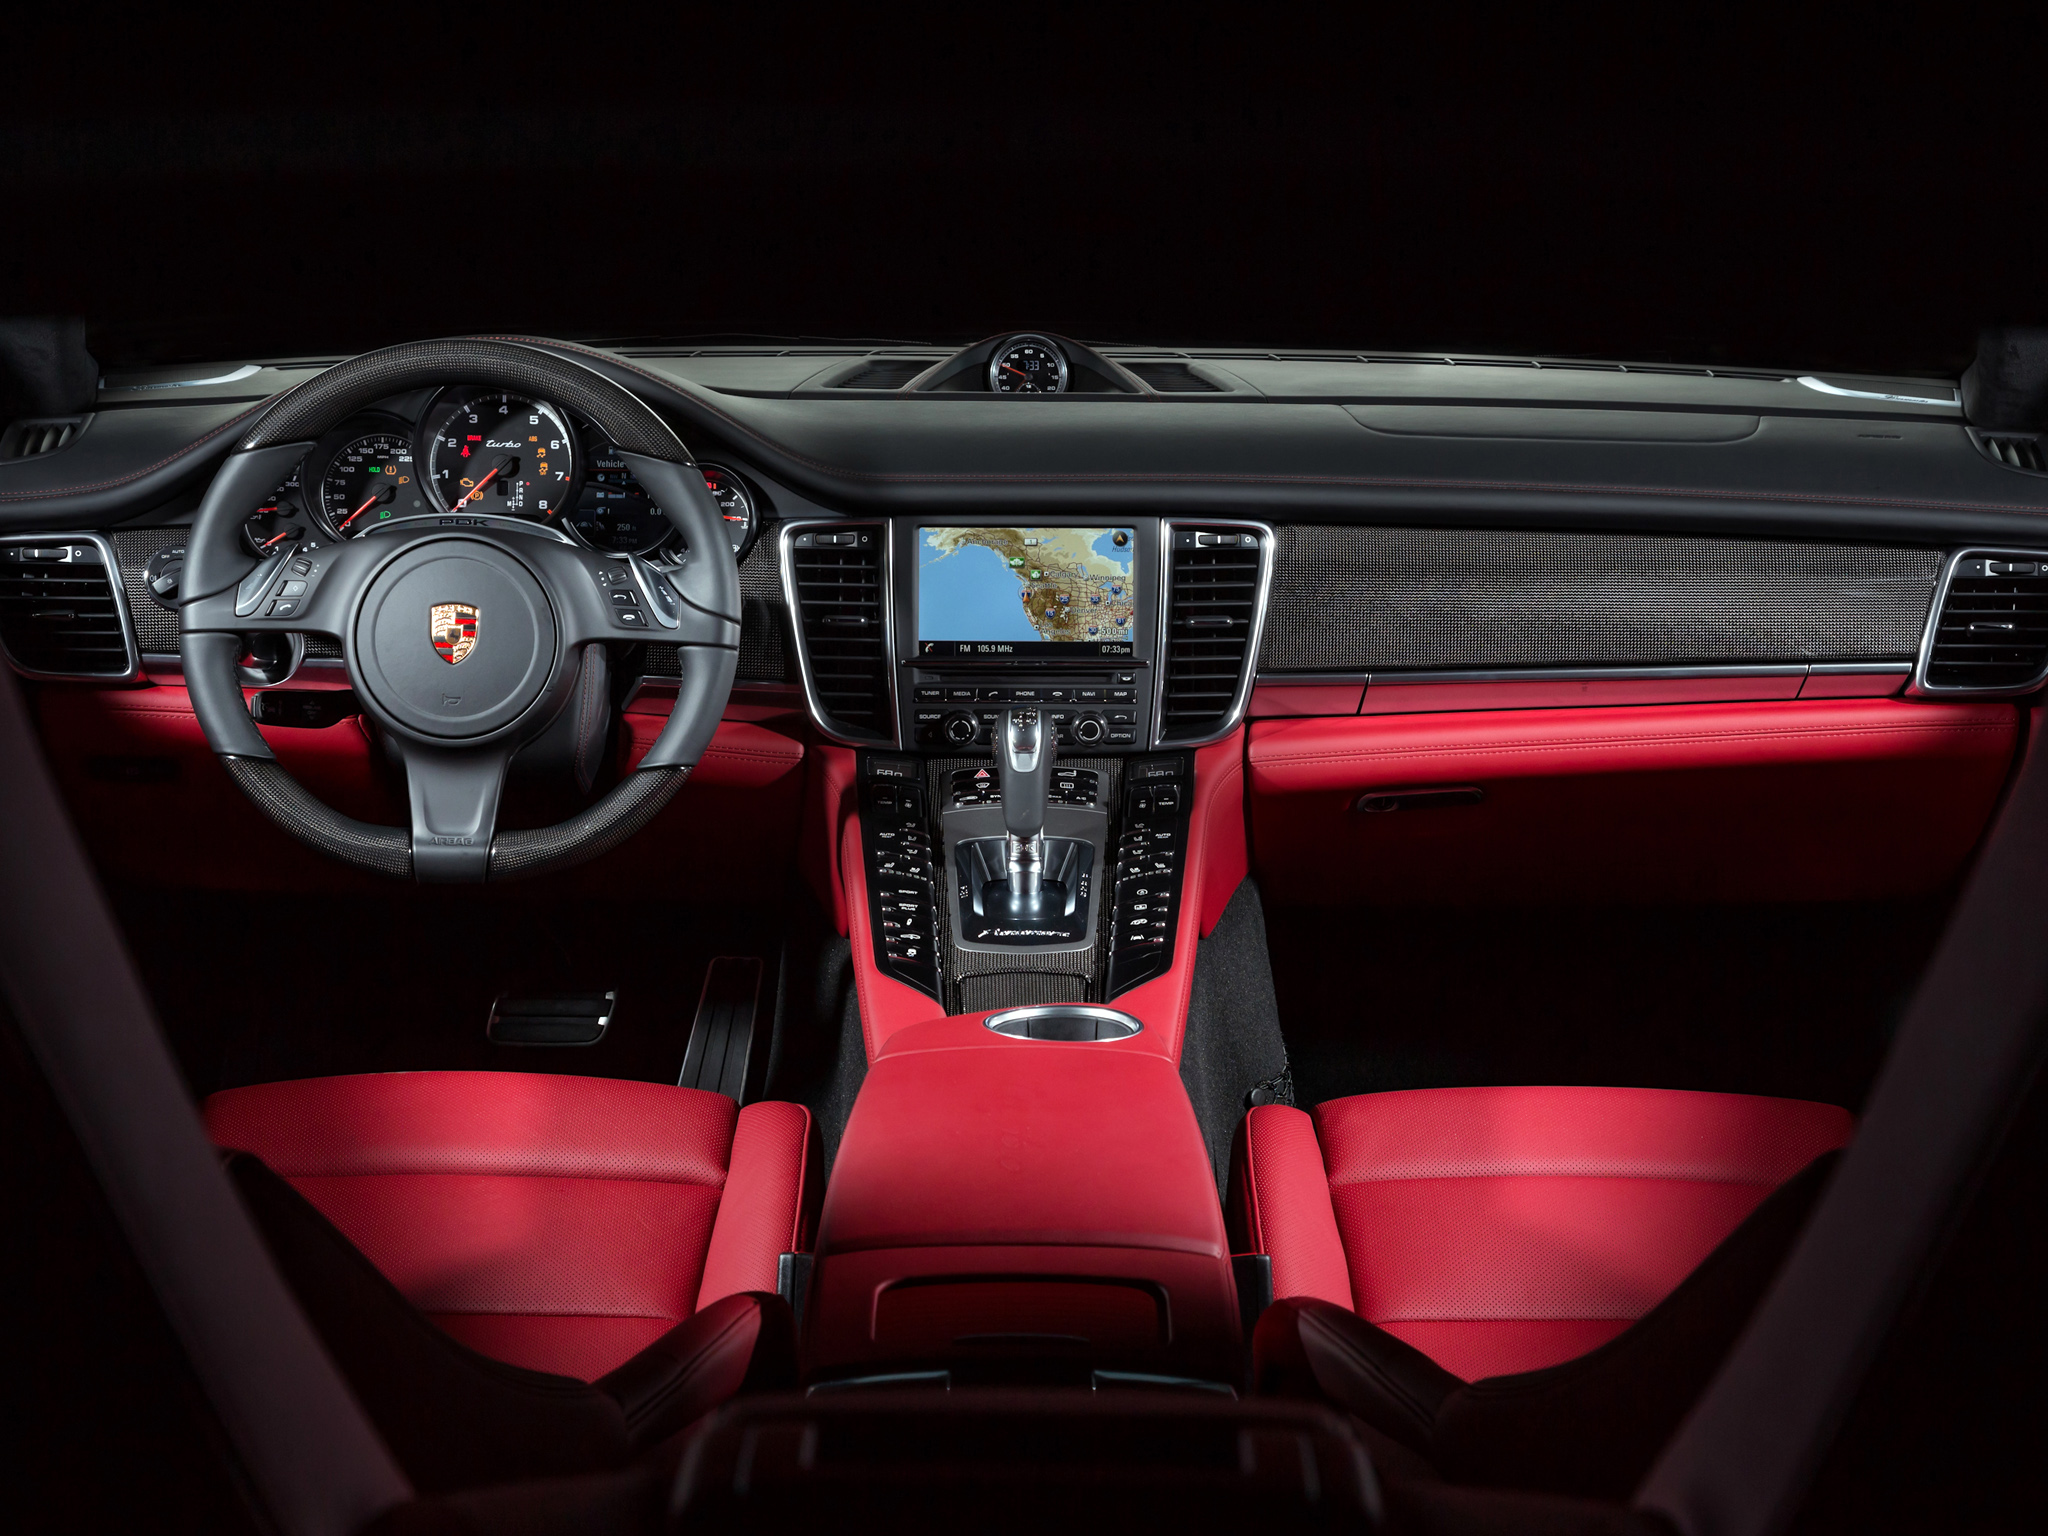 2014 porsche panamera interior car tuning - 2014 Porsche Panamera Turbo Executive Us Spec 970 Interior F Wallpaper 2048x1536 214977 Wallpaperup